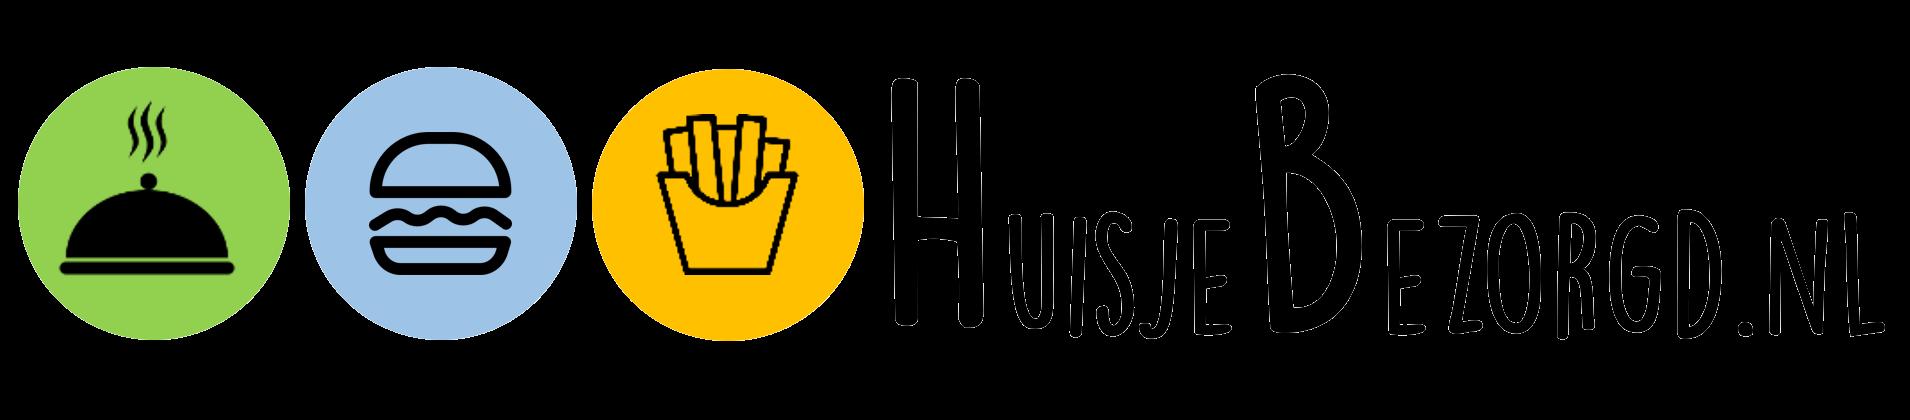 Logo verkleind Huisjebezorgd.nl